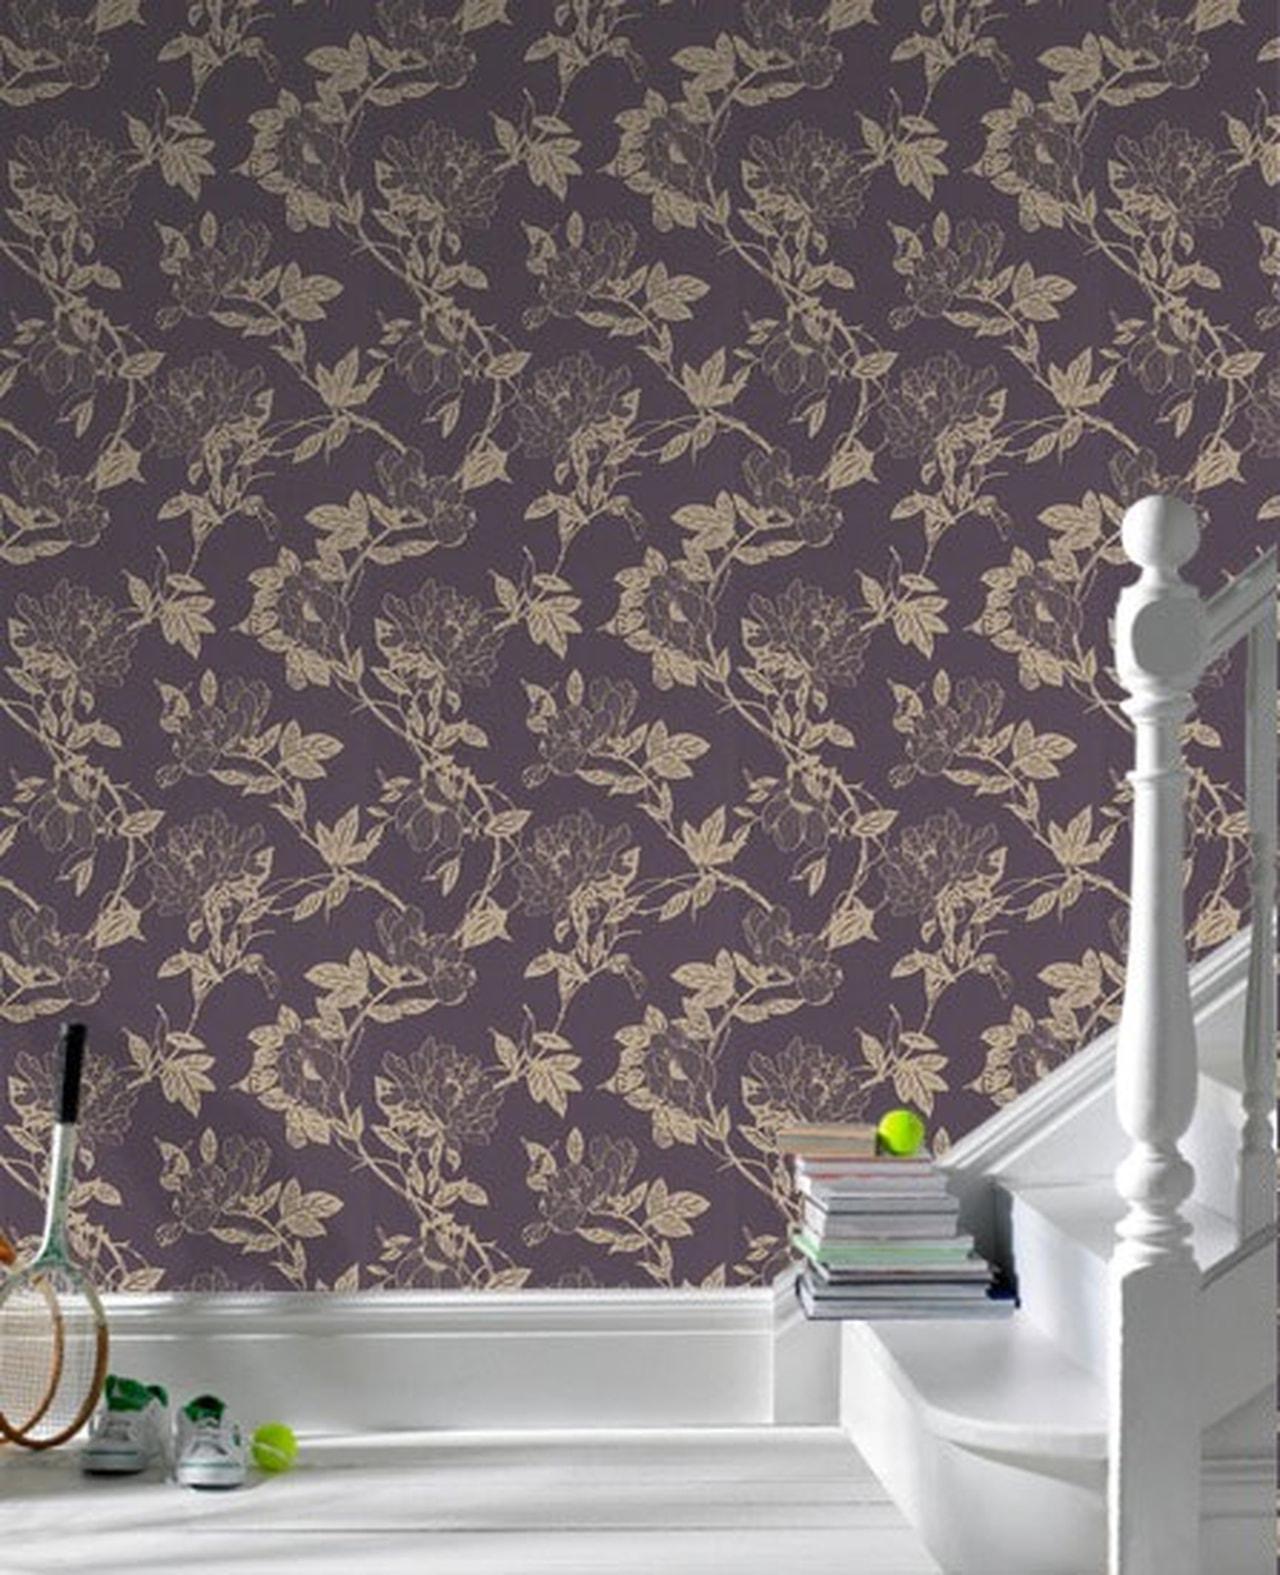 بالصور ورق جدران ايكيا , شاهد احدث تصاميم لورق الجدران 1780 8